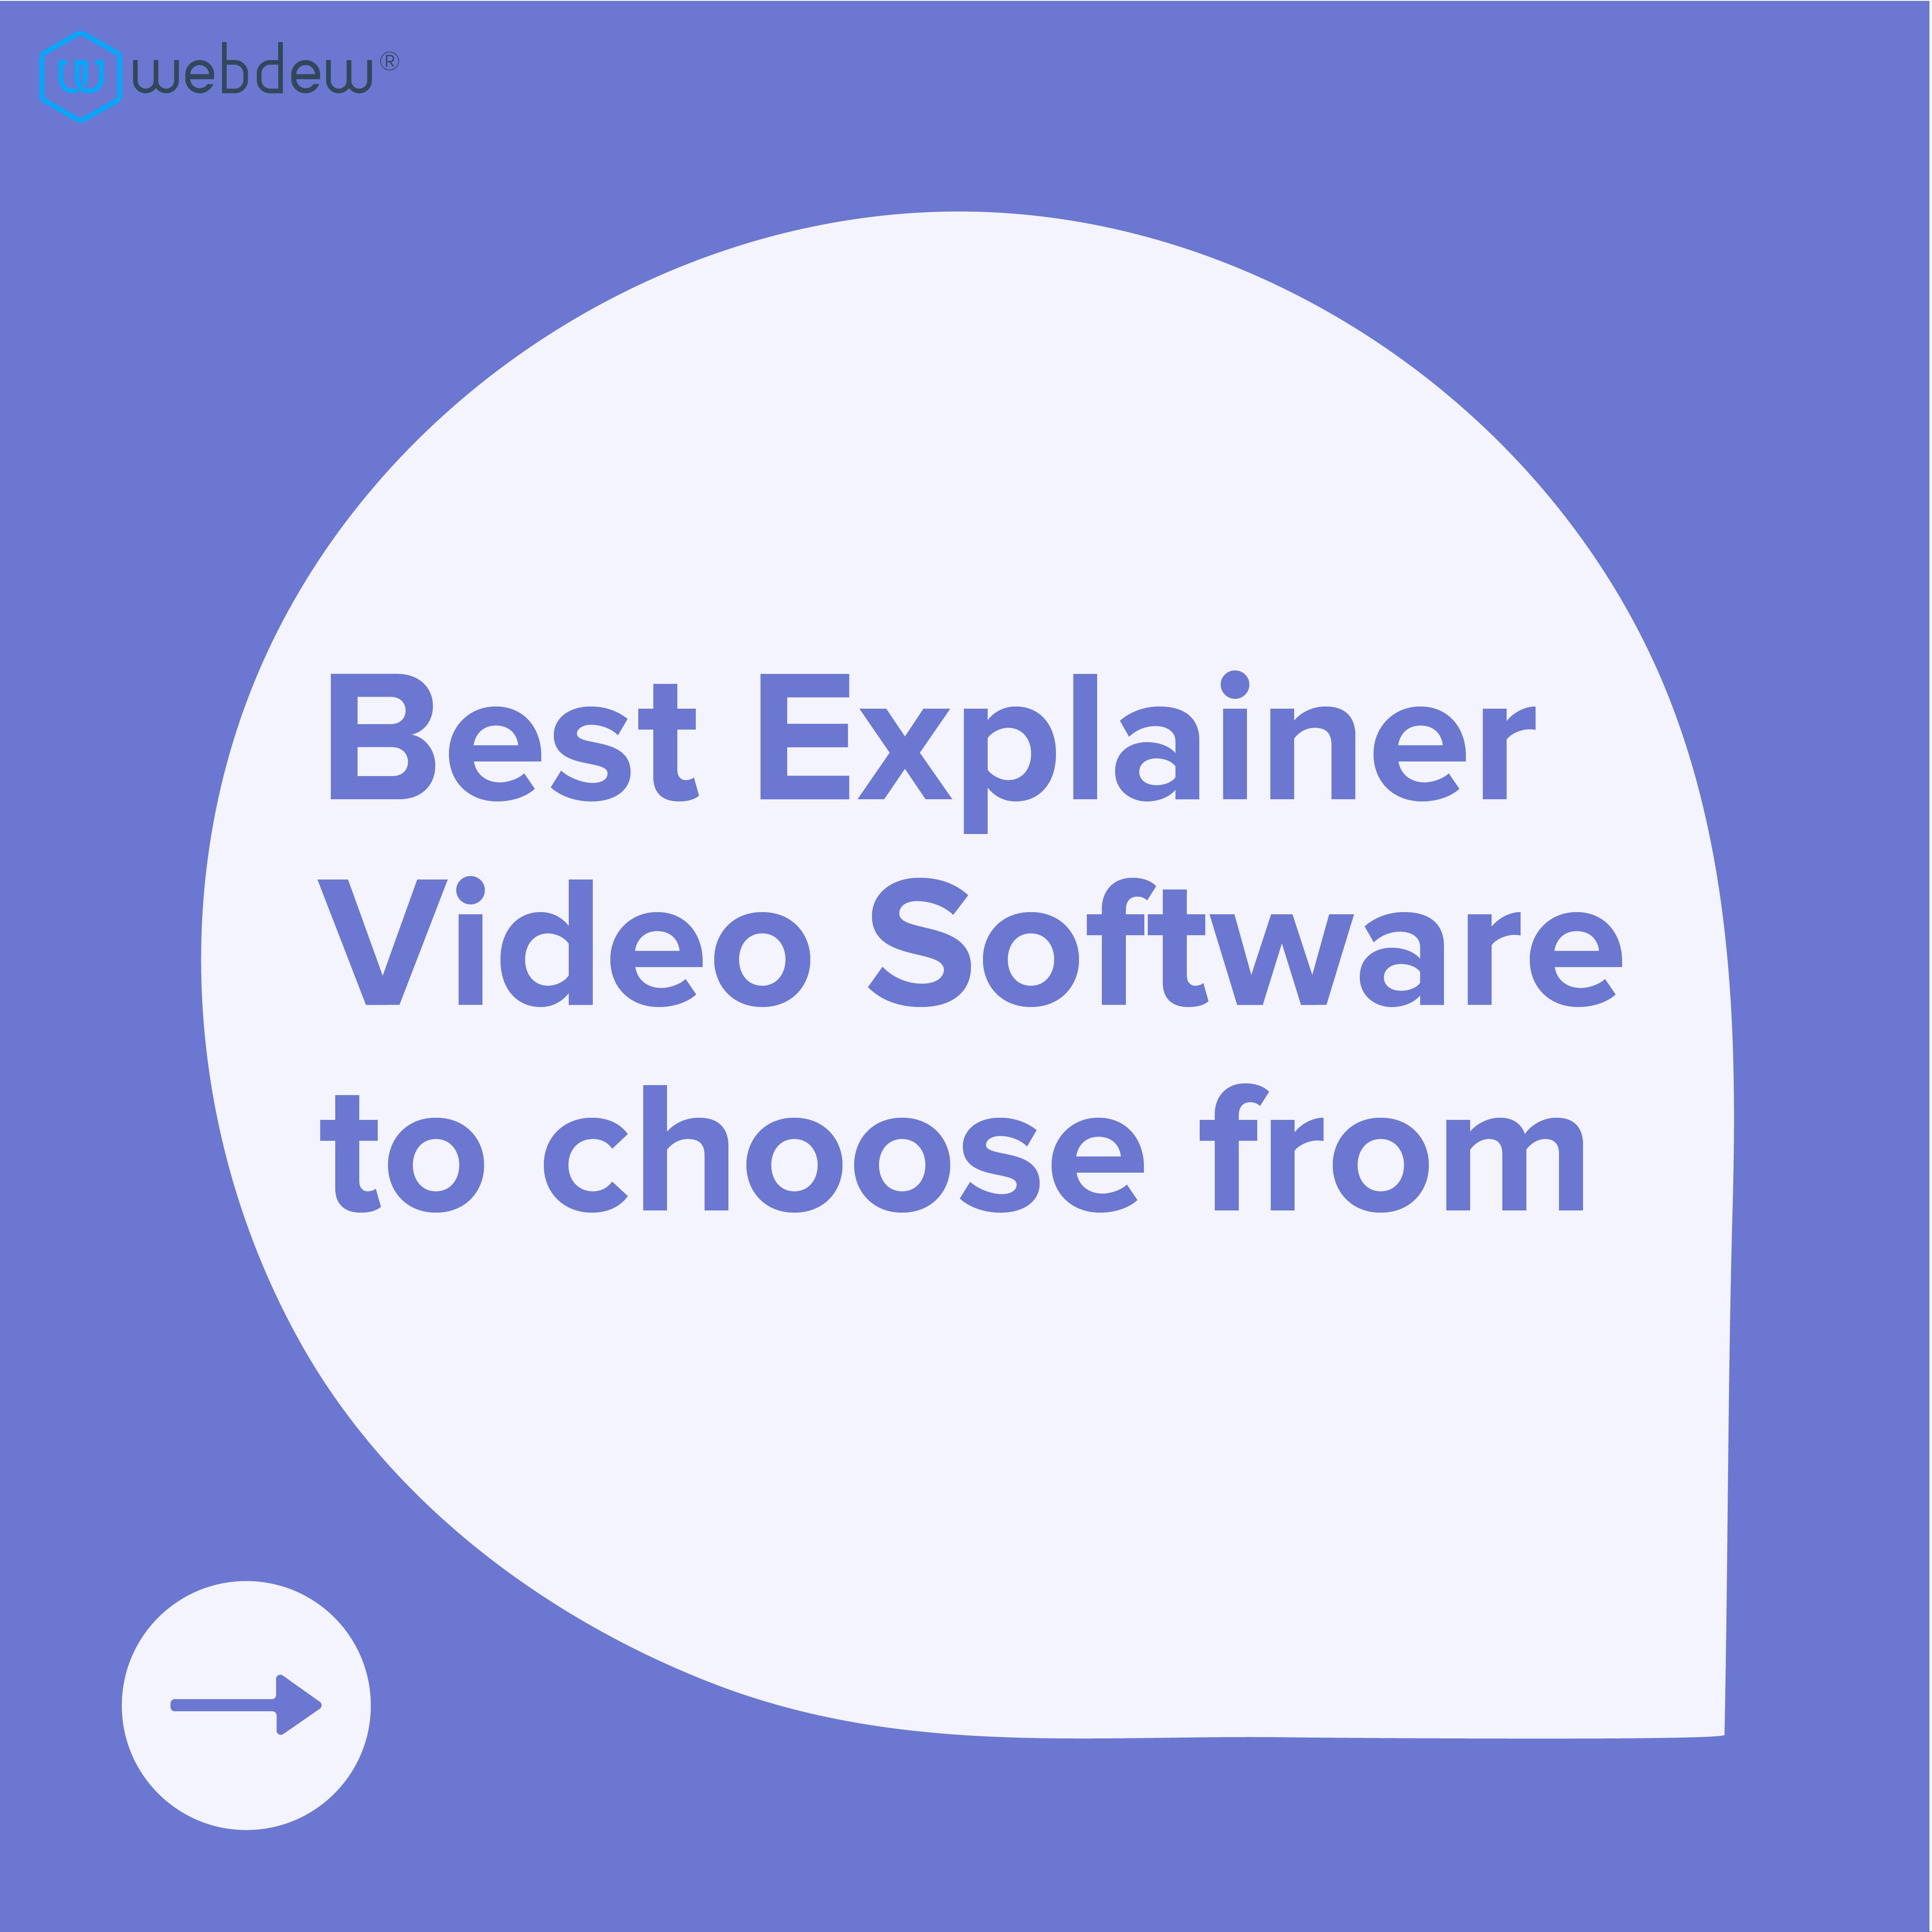 best-explainer-video-software